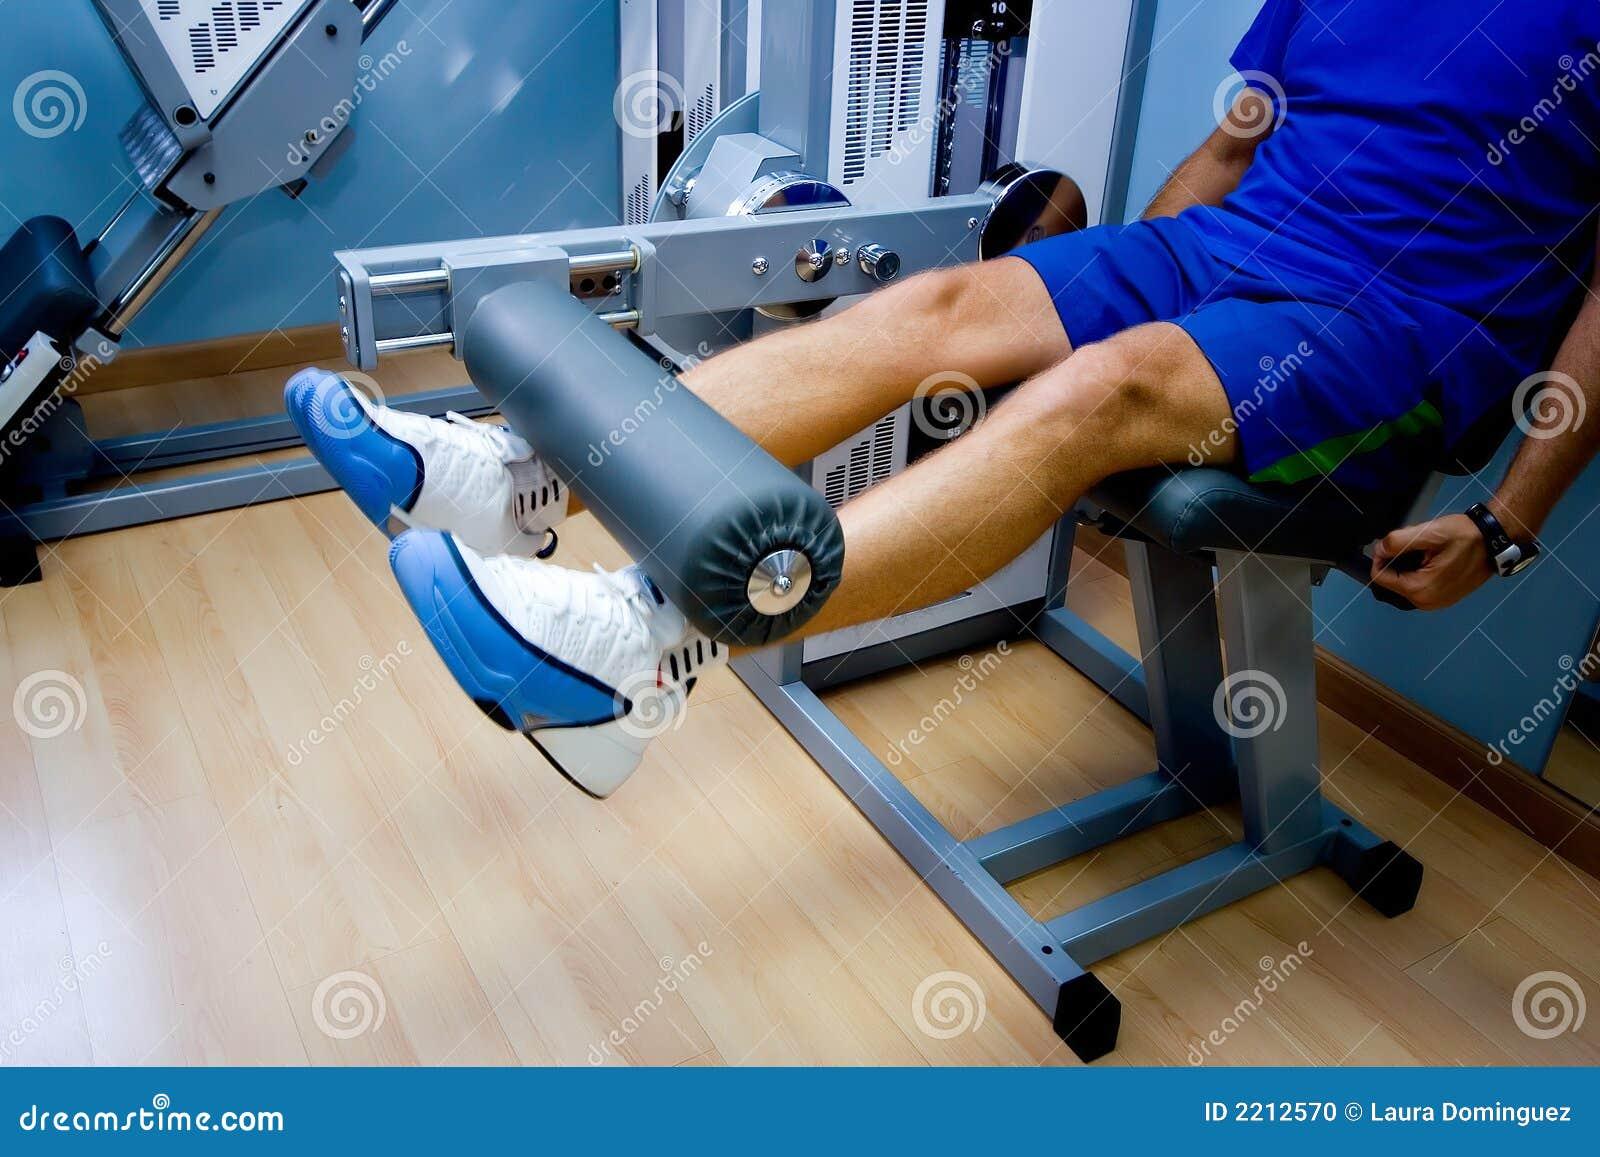 Free Images : active, athlete, barbell, bodybuilder